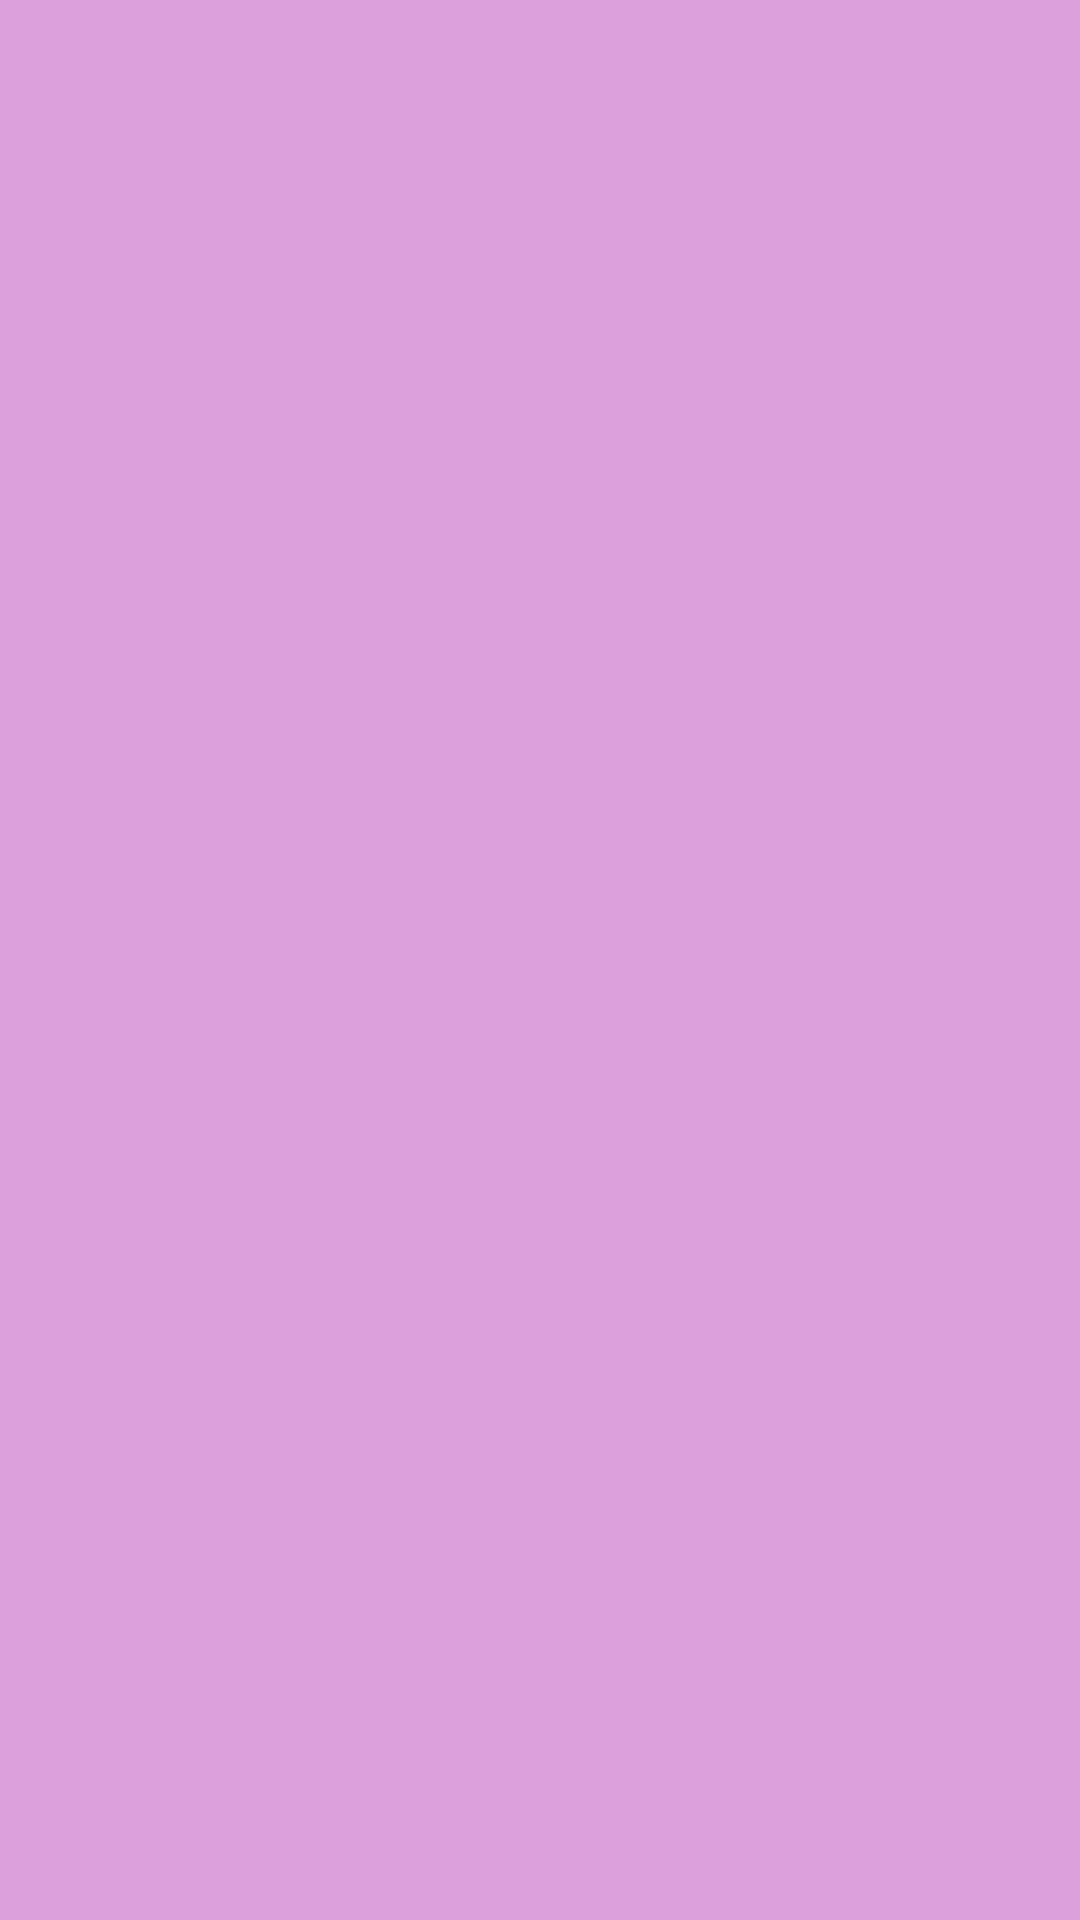 1080x1920 Plum Web Solid Color Background